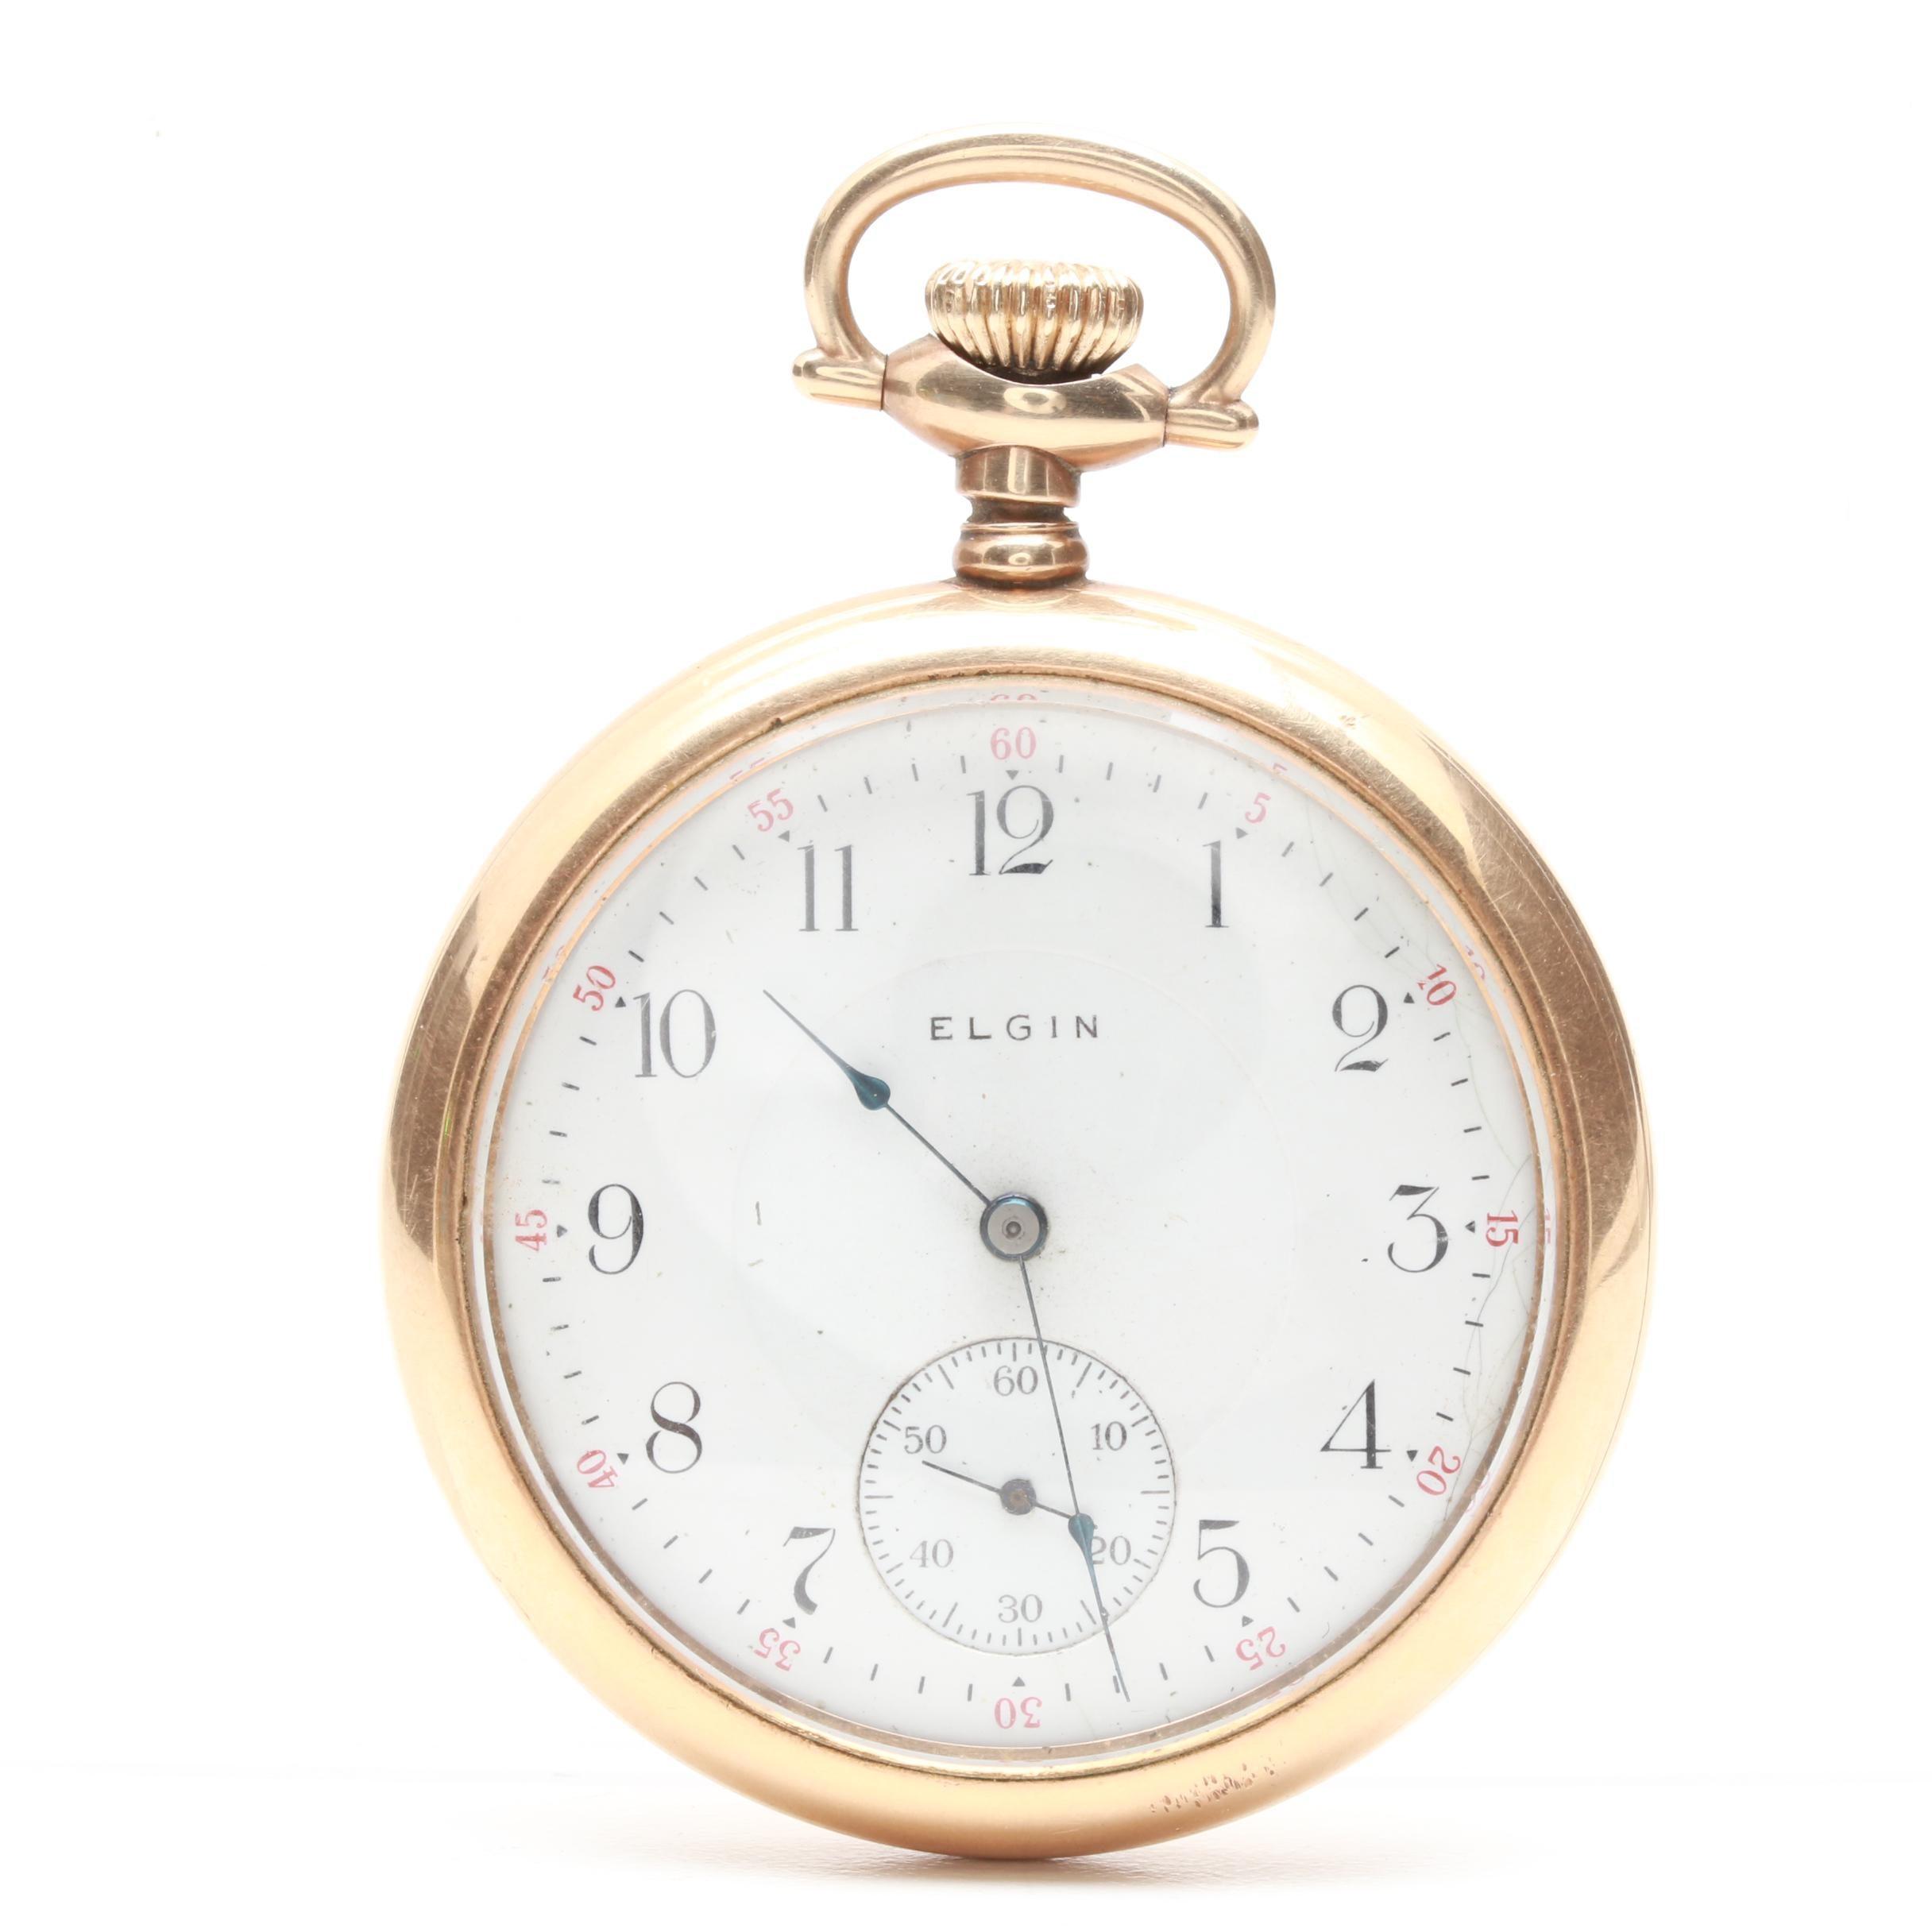 Elgin Gold-Filled White Dial Pocket Watch